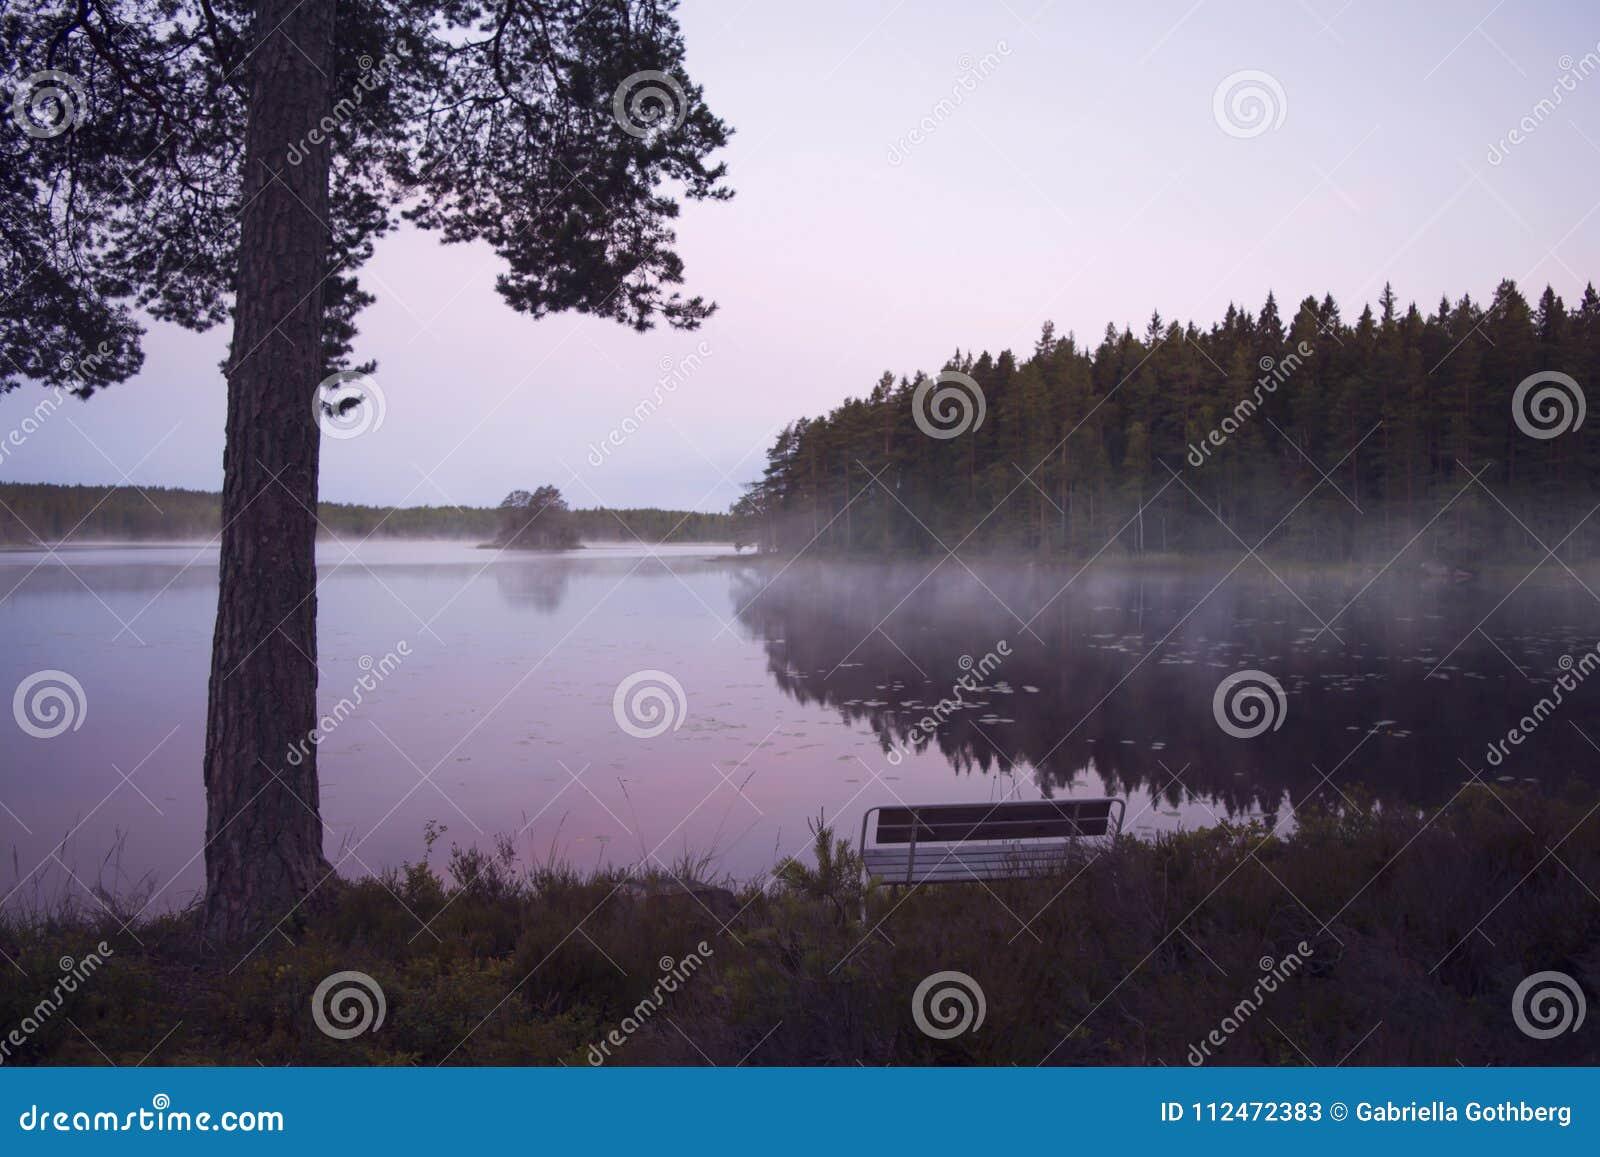 Bench by misty lake in beautiful sunrise.